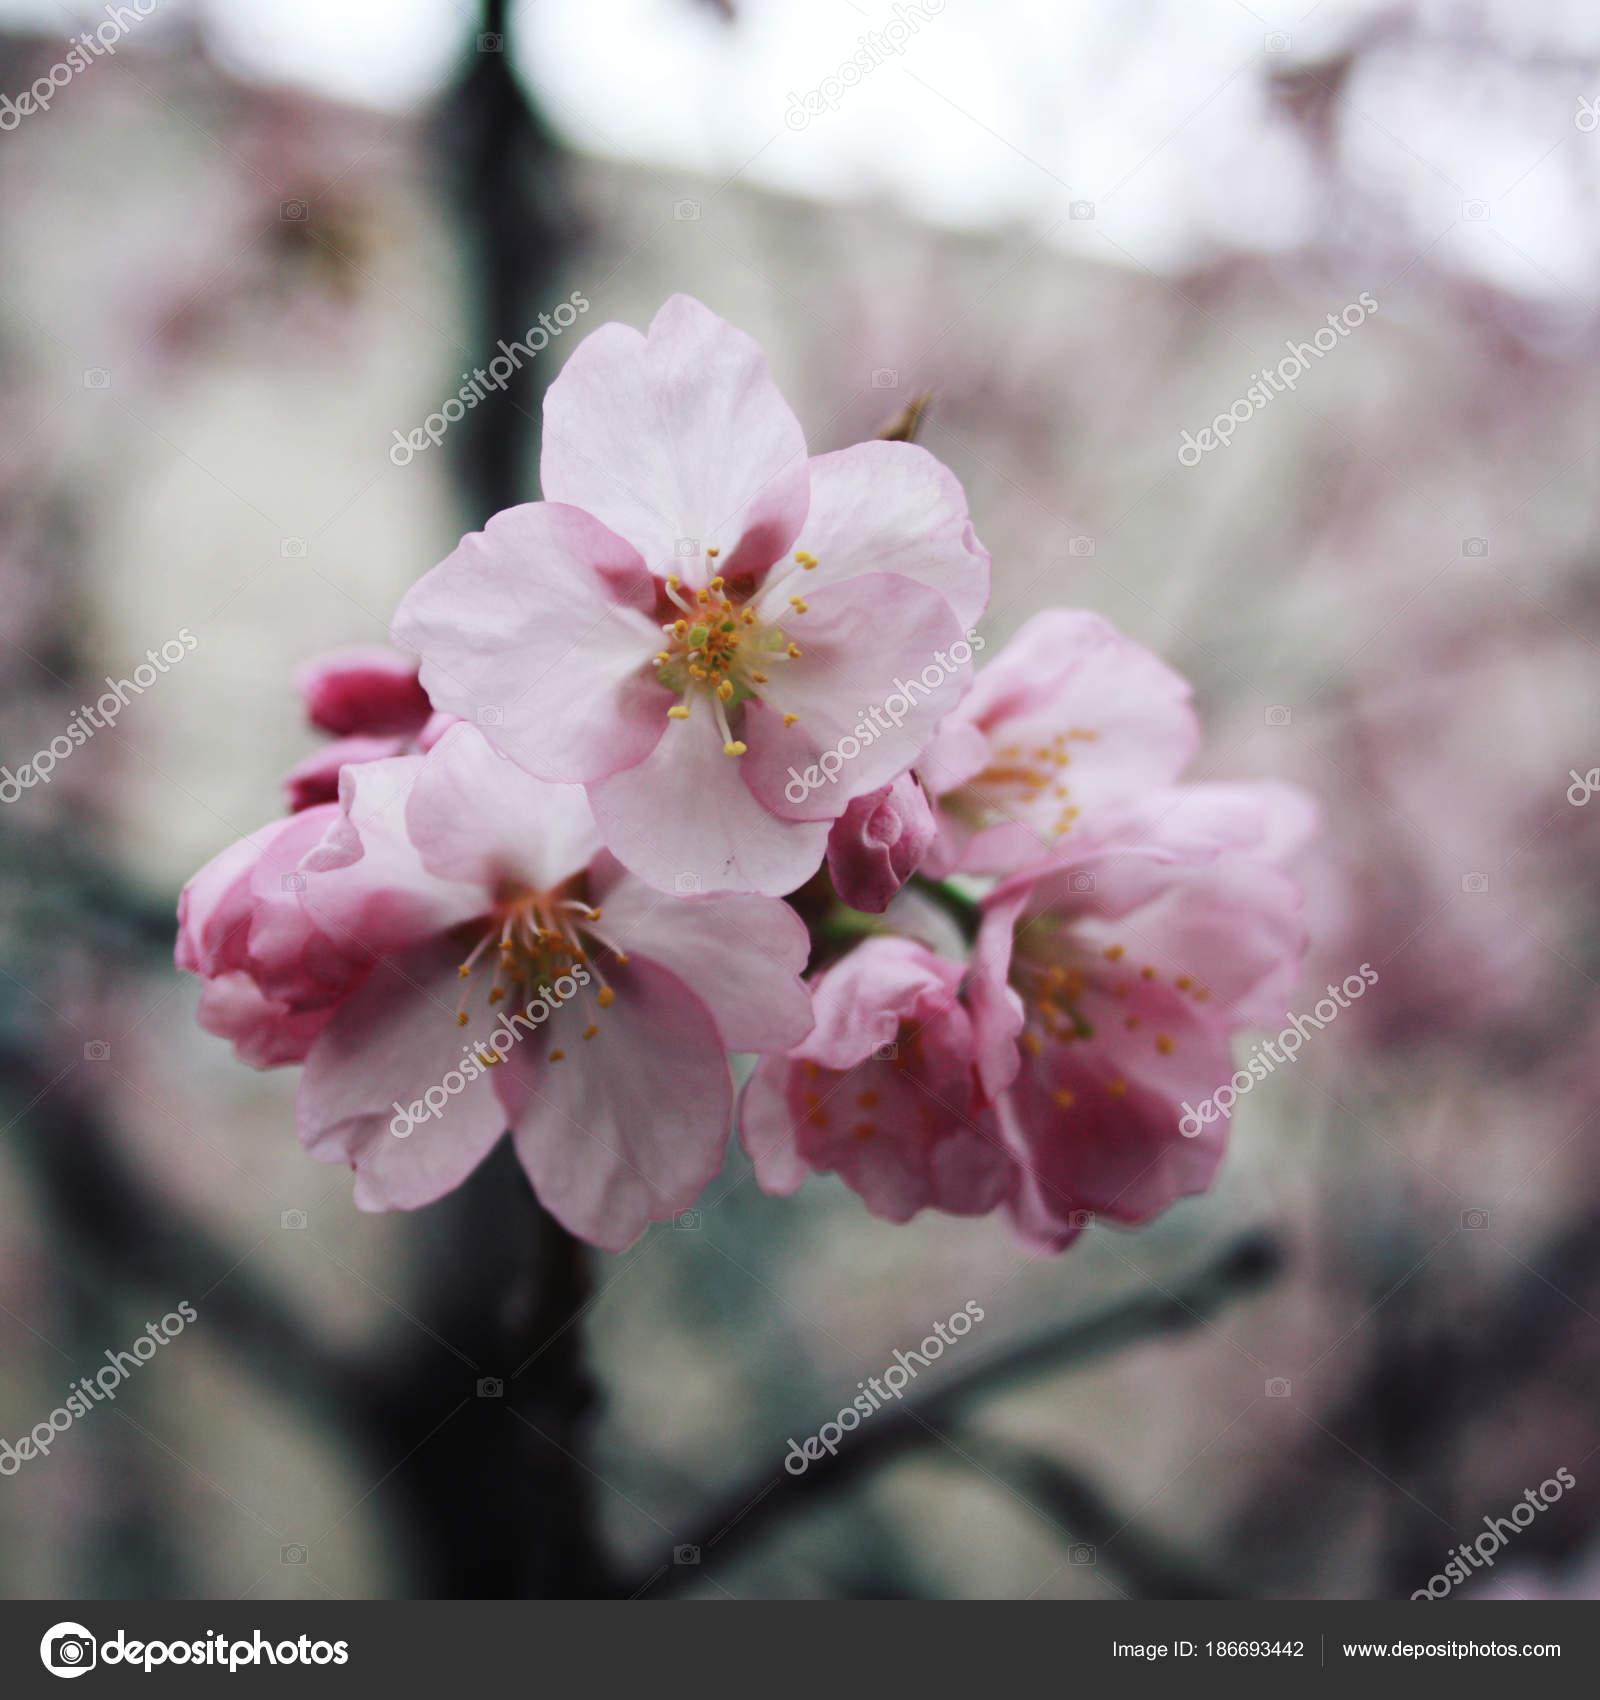 Pink sakura bloom spring season toned photo stock photo lora pink sakura bloom spring season toned photo flowers bloom in spring season sakura blossom time blossoming cherry flowers in spring retro filter photo mightylinksfo